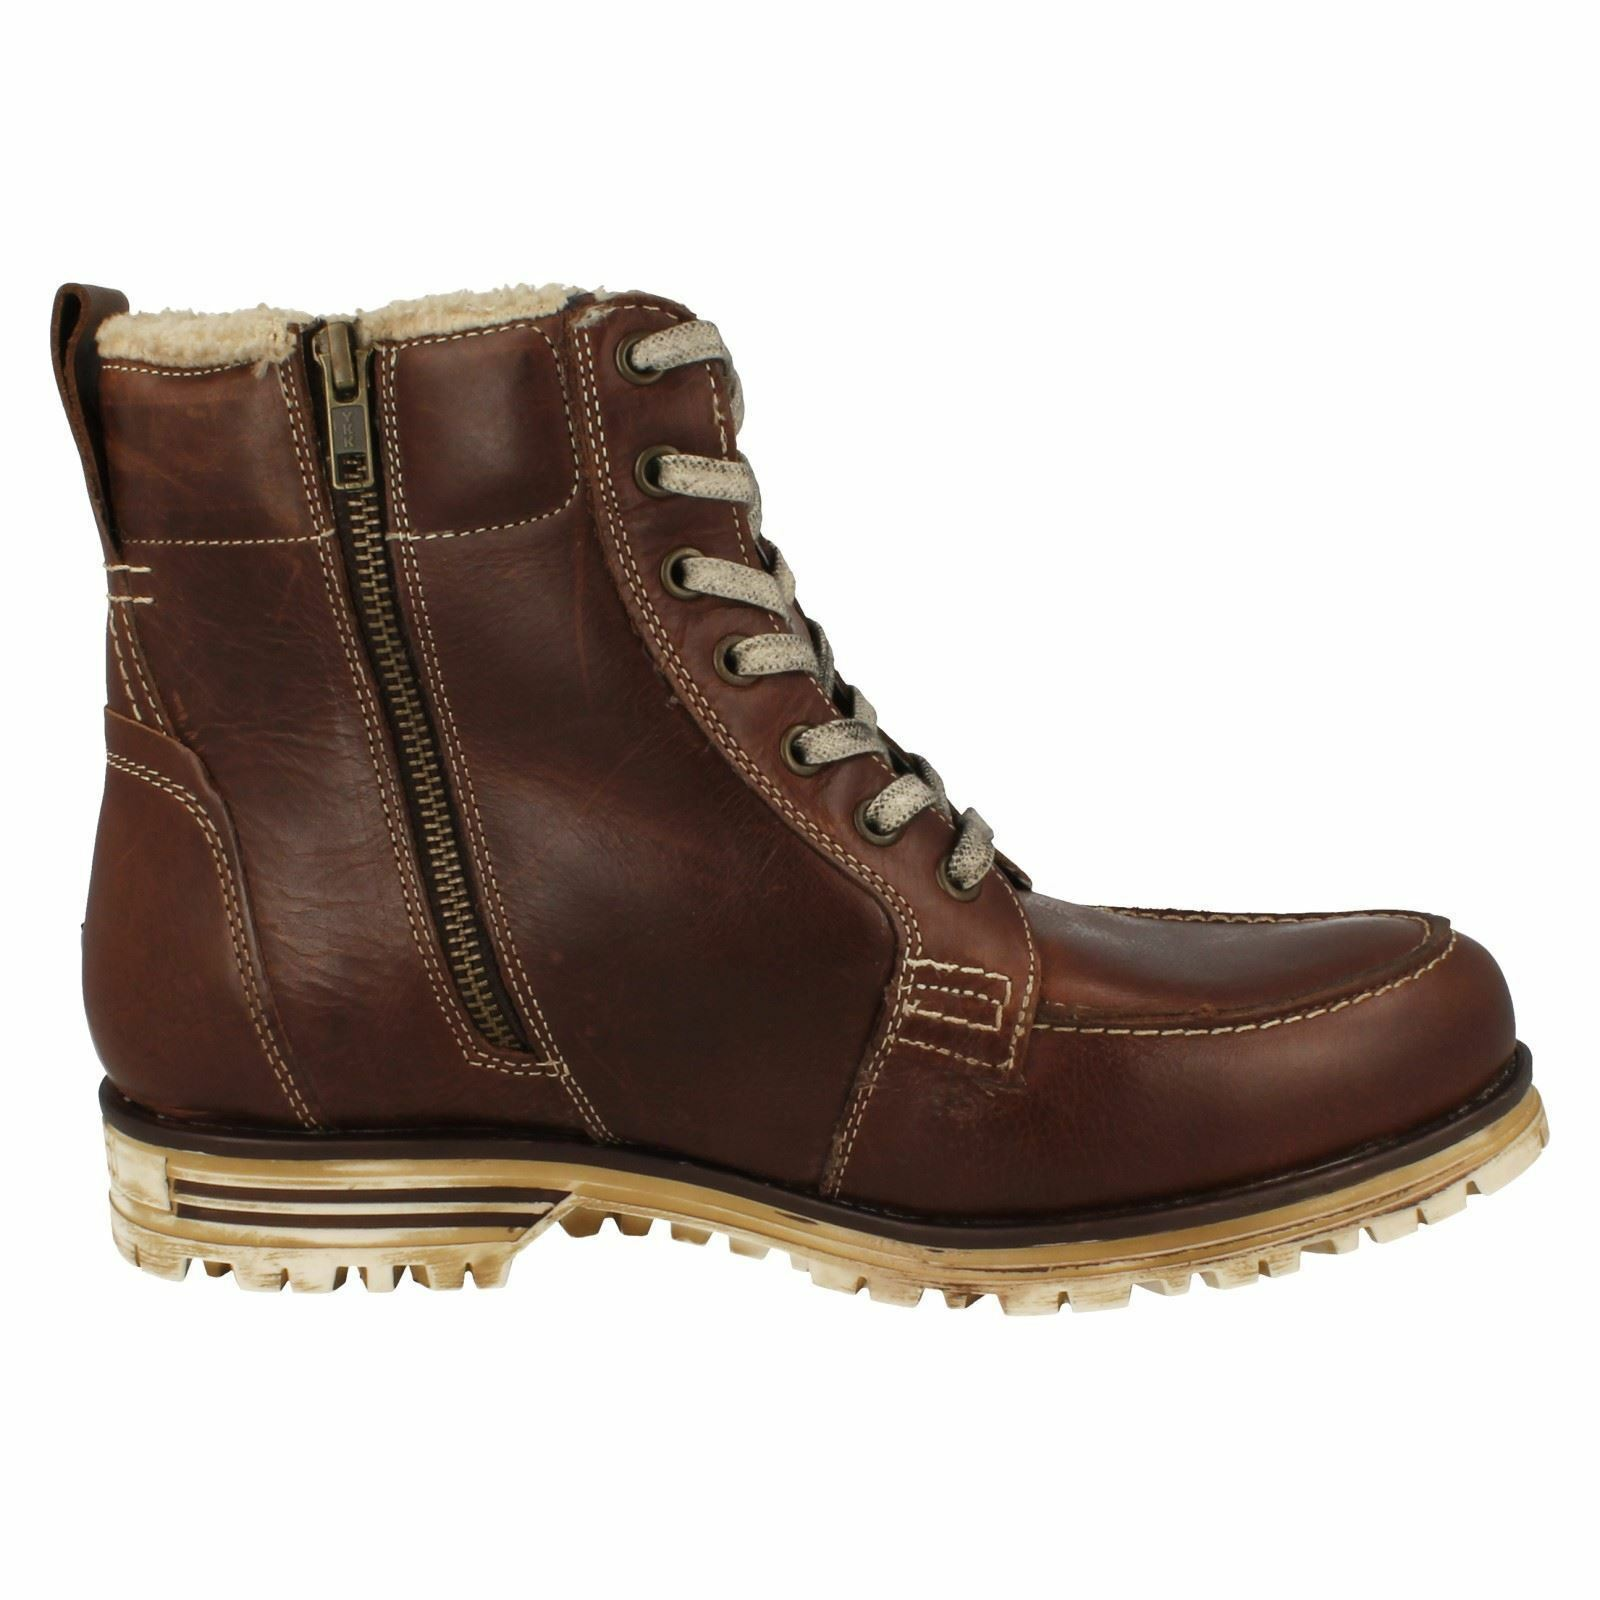 Bugatti 'Fox' Men's Dark Brown Leathr, Fur Lined. Winter Boots